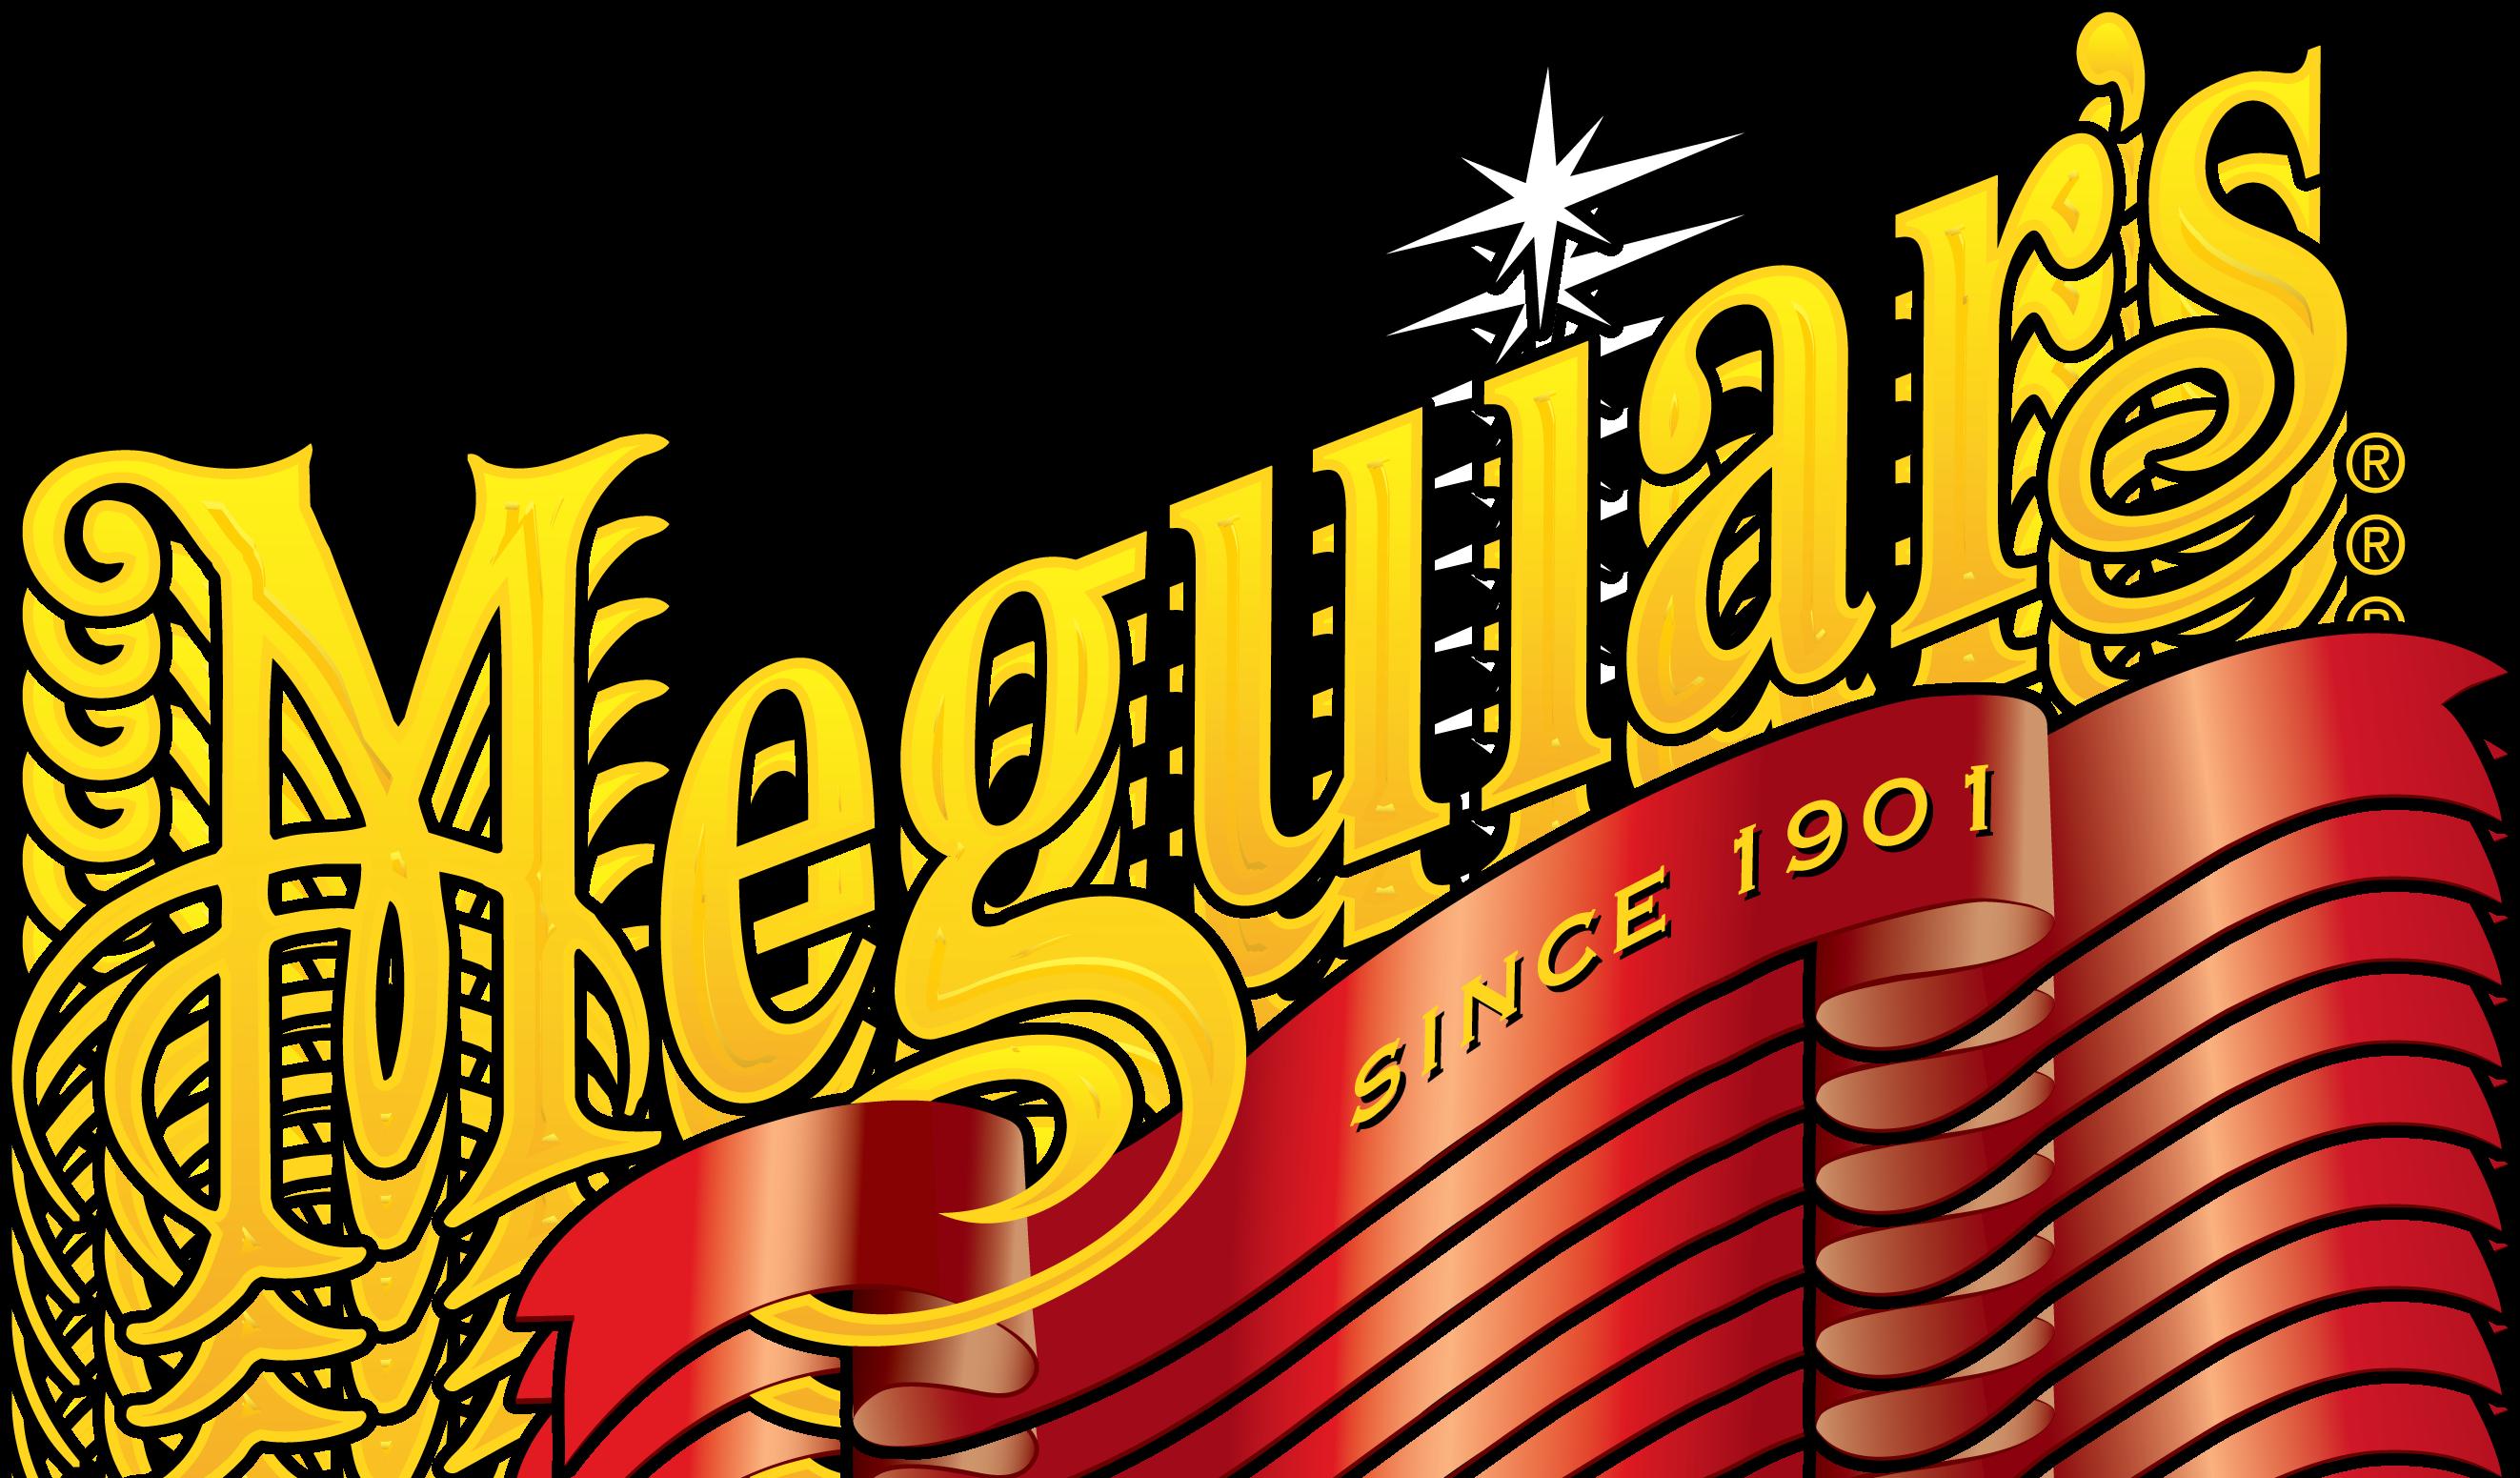 Meguiar's_logo